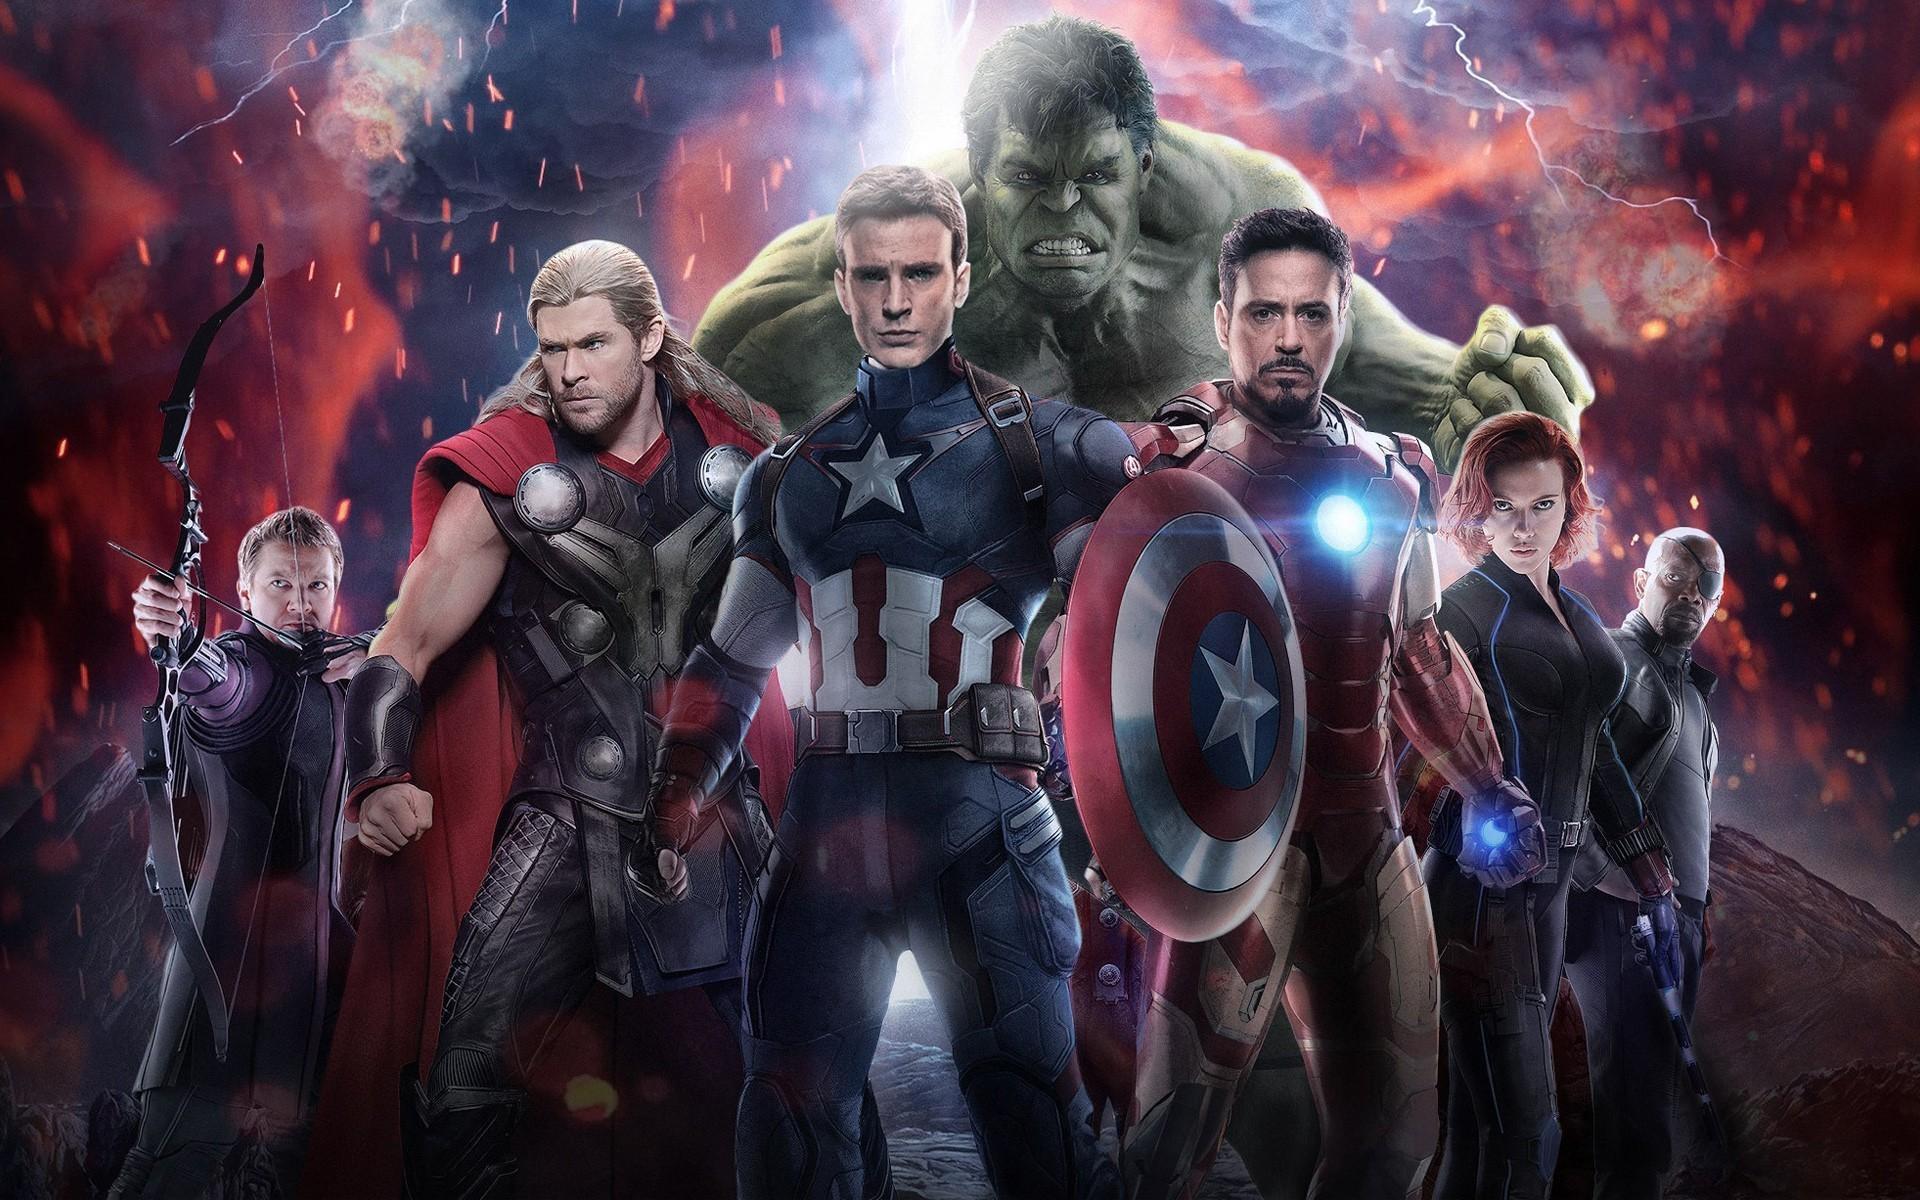 Avengers Dual Screen Wallpaper likewise Hulk Wallpapers For Pc moreover Loki Desktop Wallpaper likewise Hd Wallpaper 1920x1080 Of Movies also Avengers Infinity War Captain America Chris Evans 867546. on thor avengers widescreen wallpapers